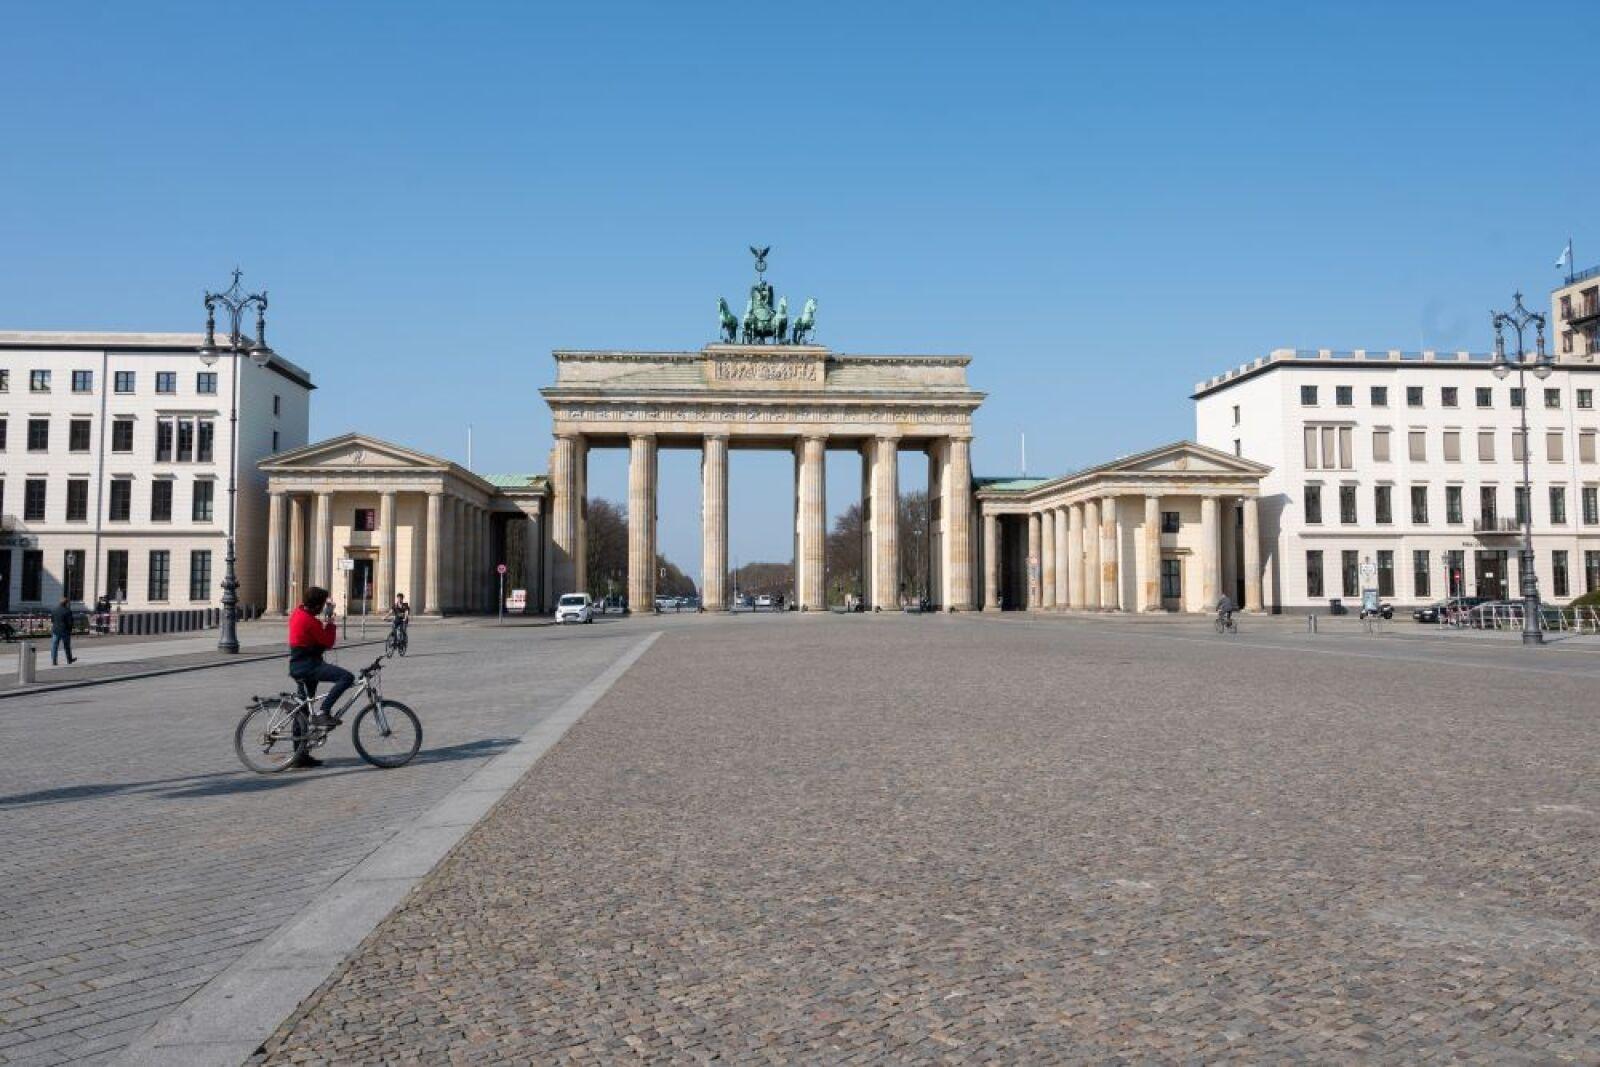 Puerta de Brandeburgo 2.jpg